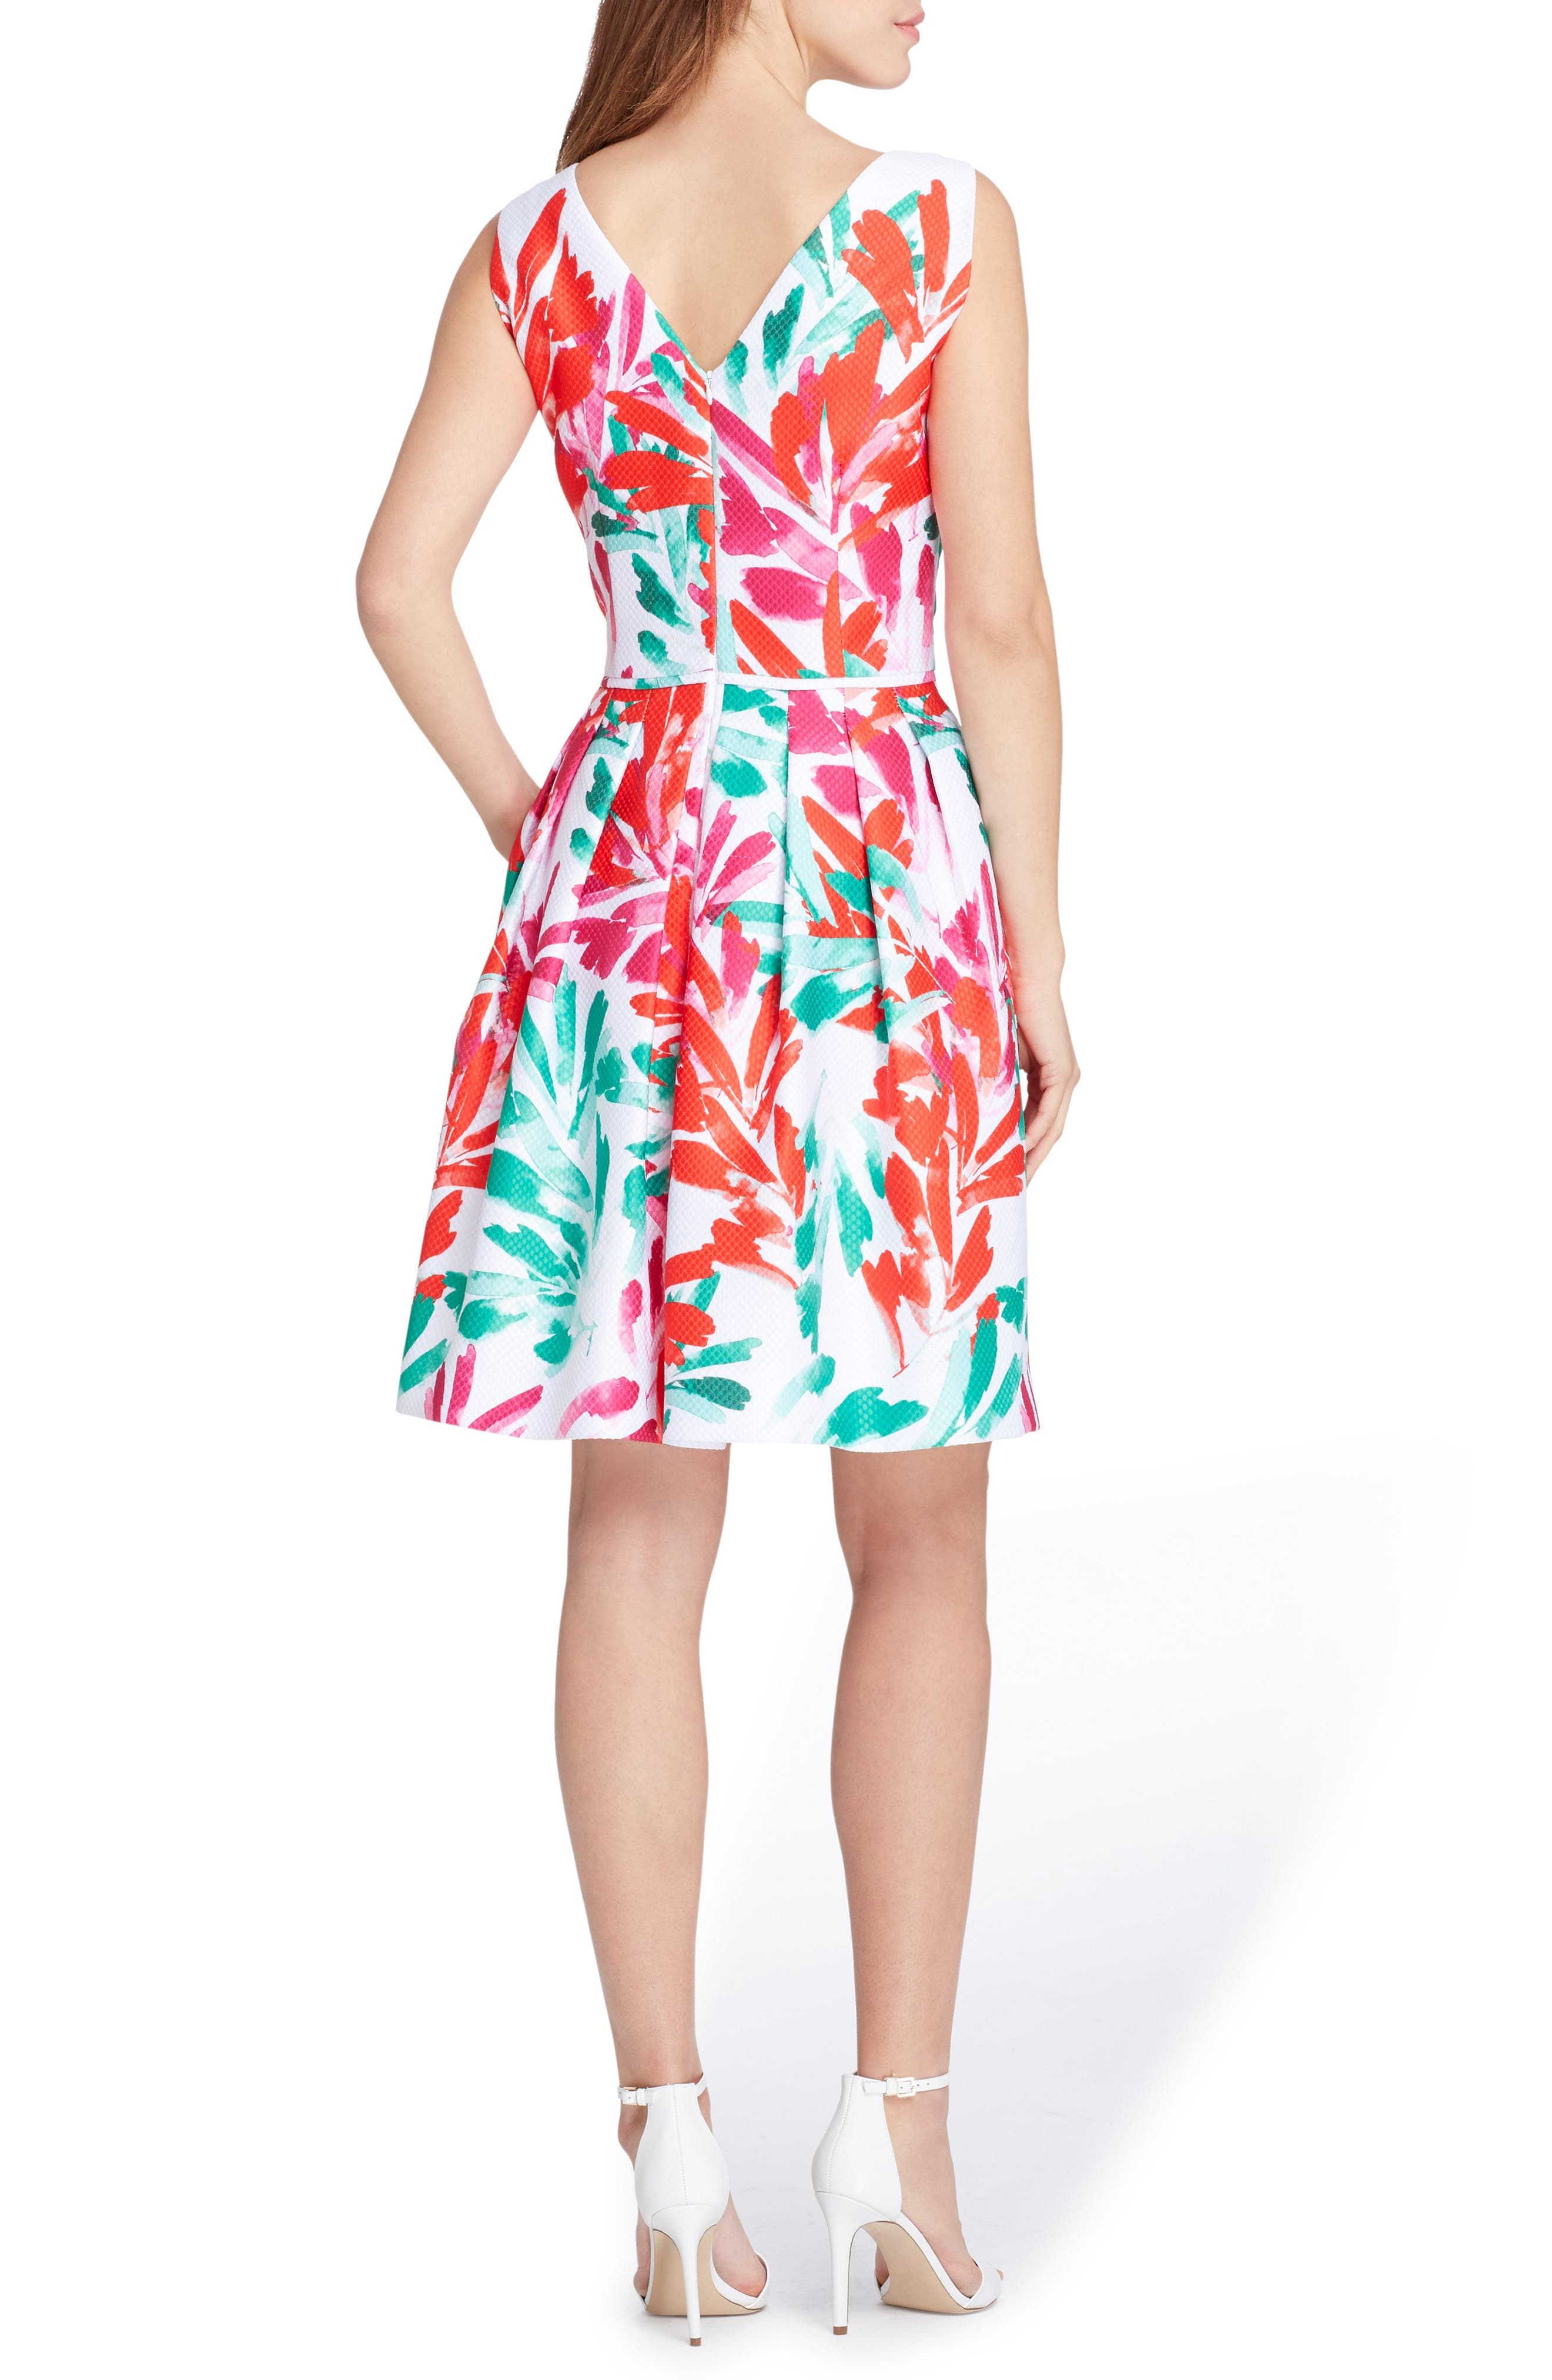 Print Jacquard Dress,                             Alternate thumbnail 2, color,                             White/ Coral/ Sea Glass